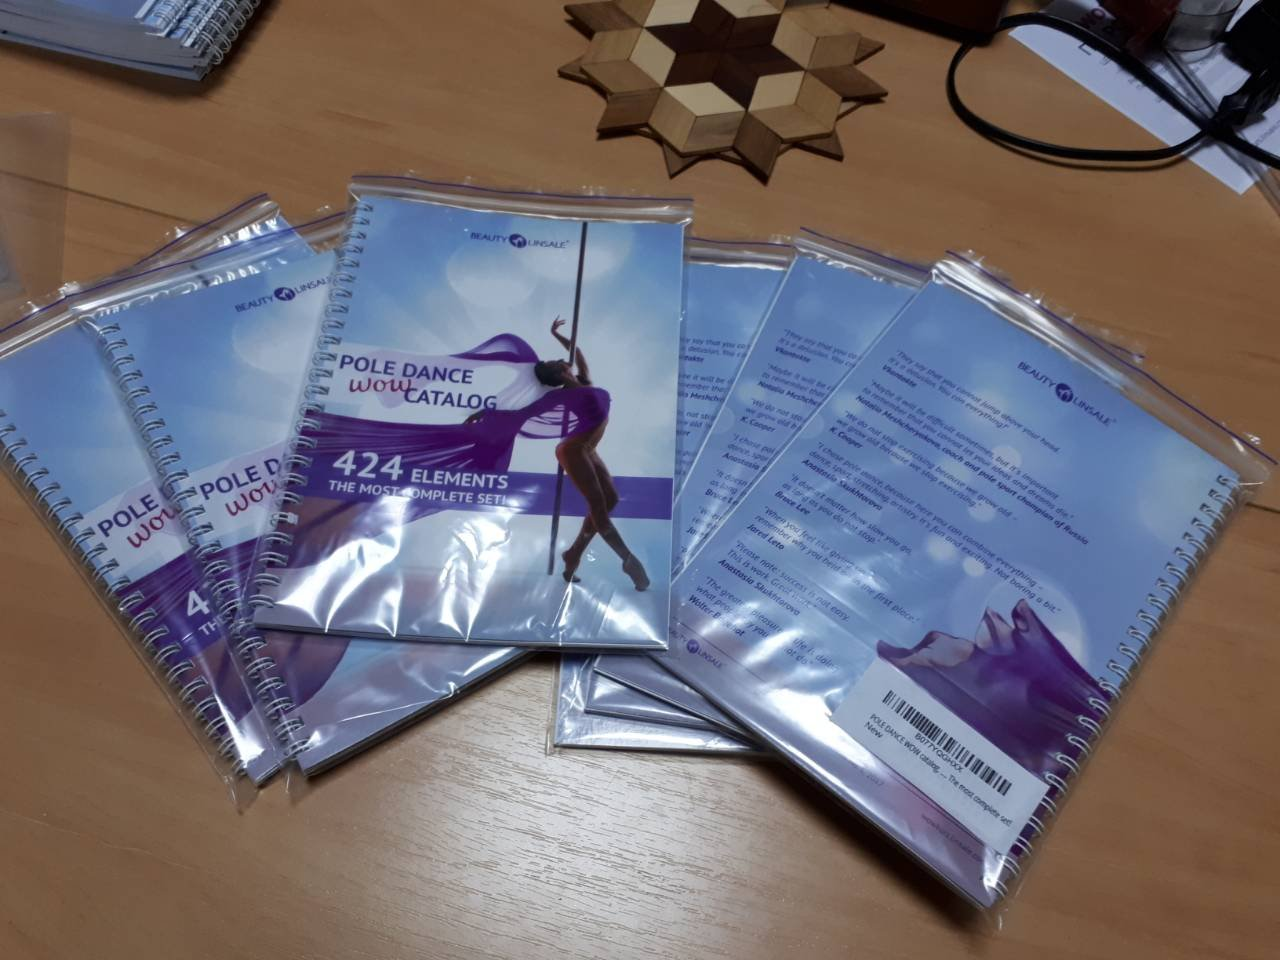 POLE DANCE WOW catalog. 424 elements. The most complete set! by SP Seredniak T.K.